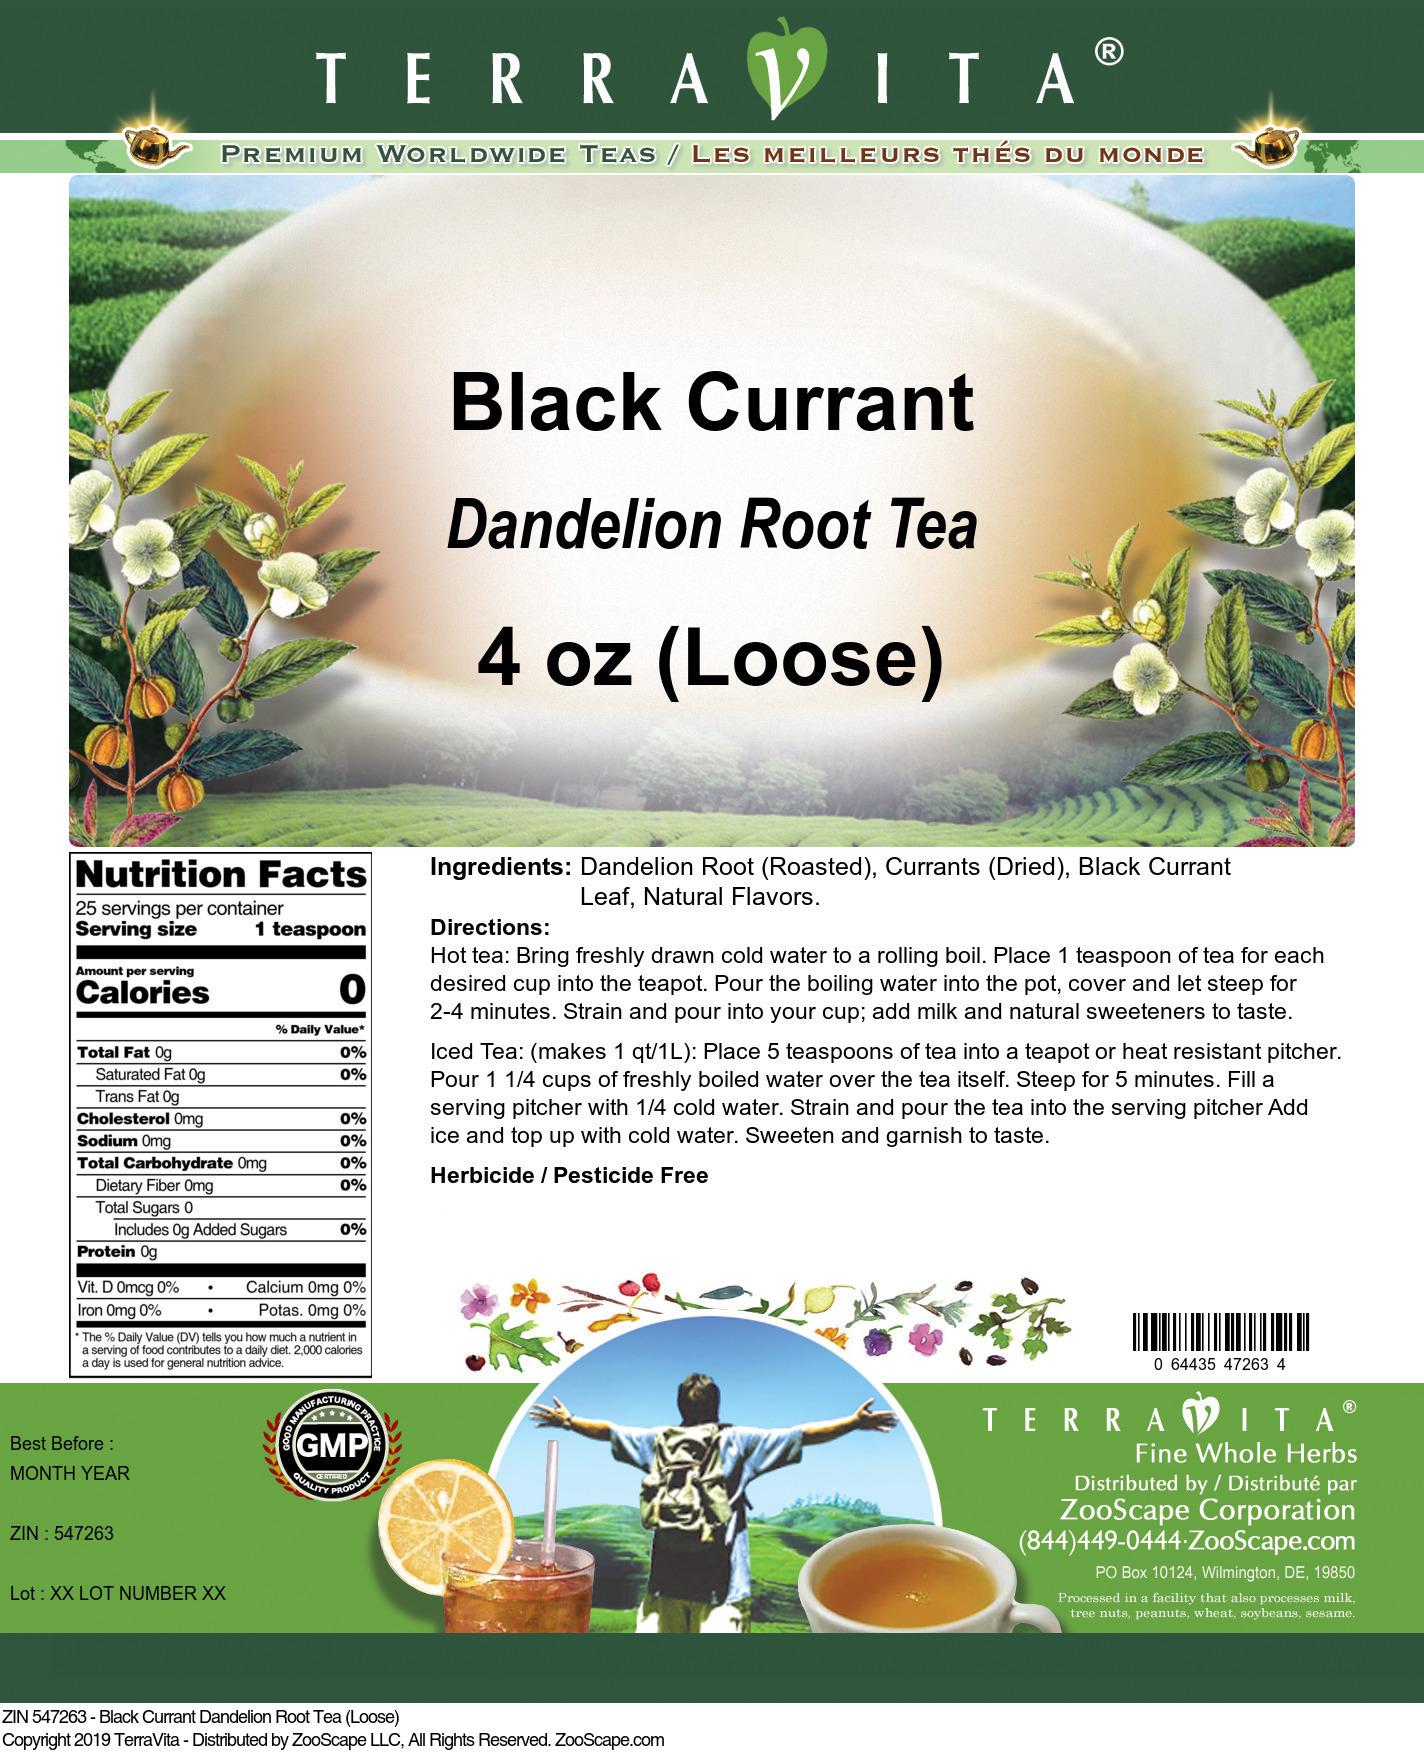 Black Currant Dandelion Root Tea (Loose)